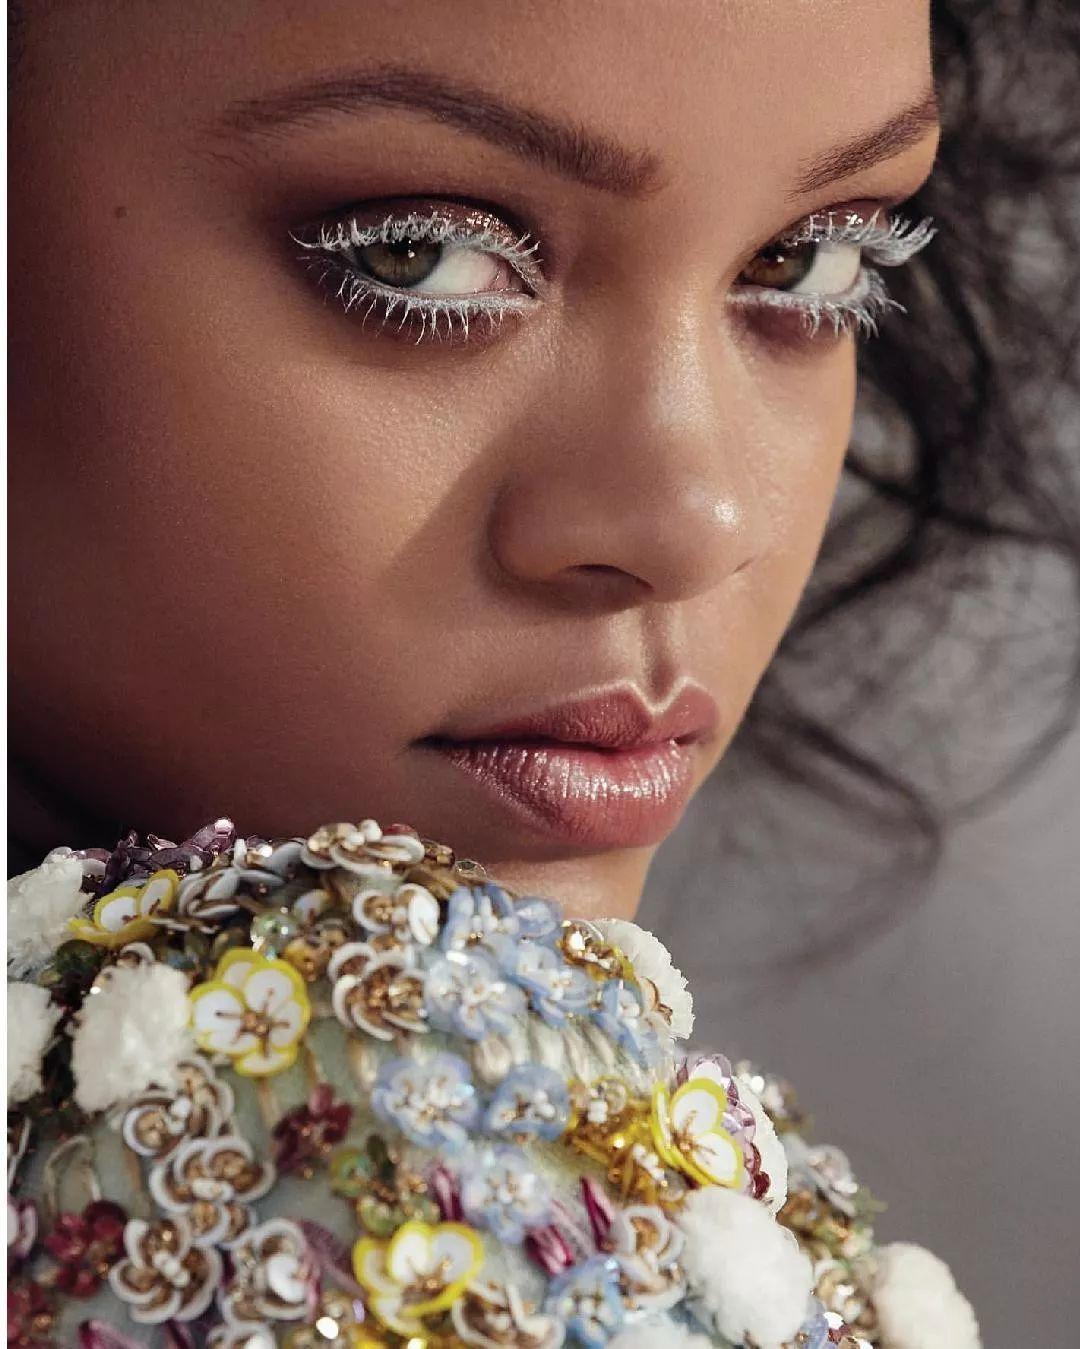 Rihanna个人奢侈品牌「FENTY」今日发售,快来迅速补充知识!